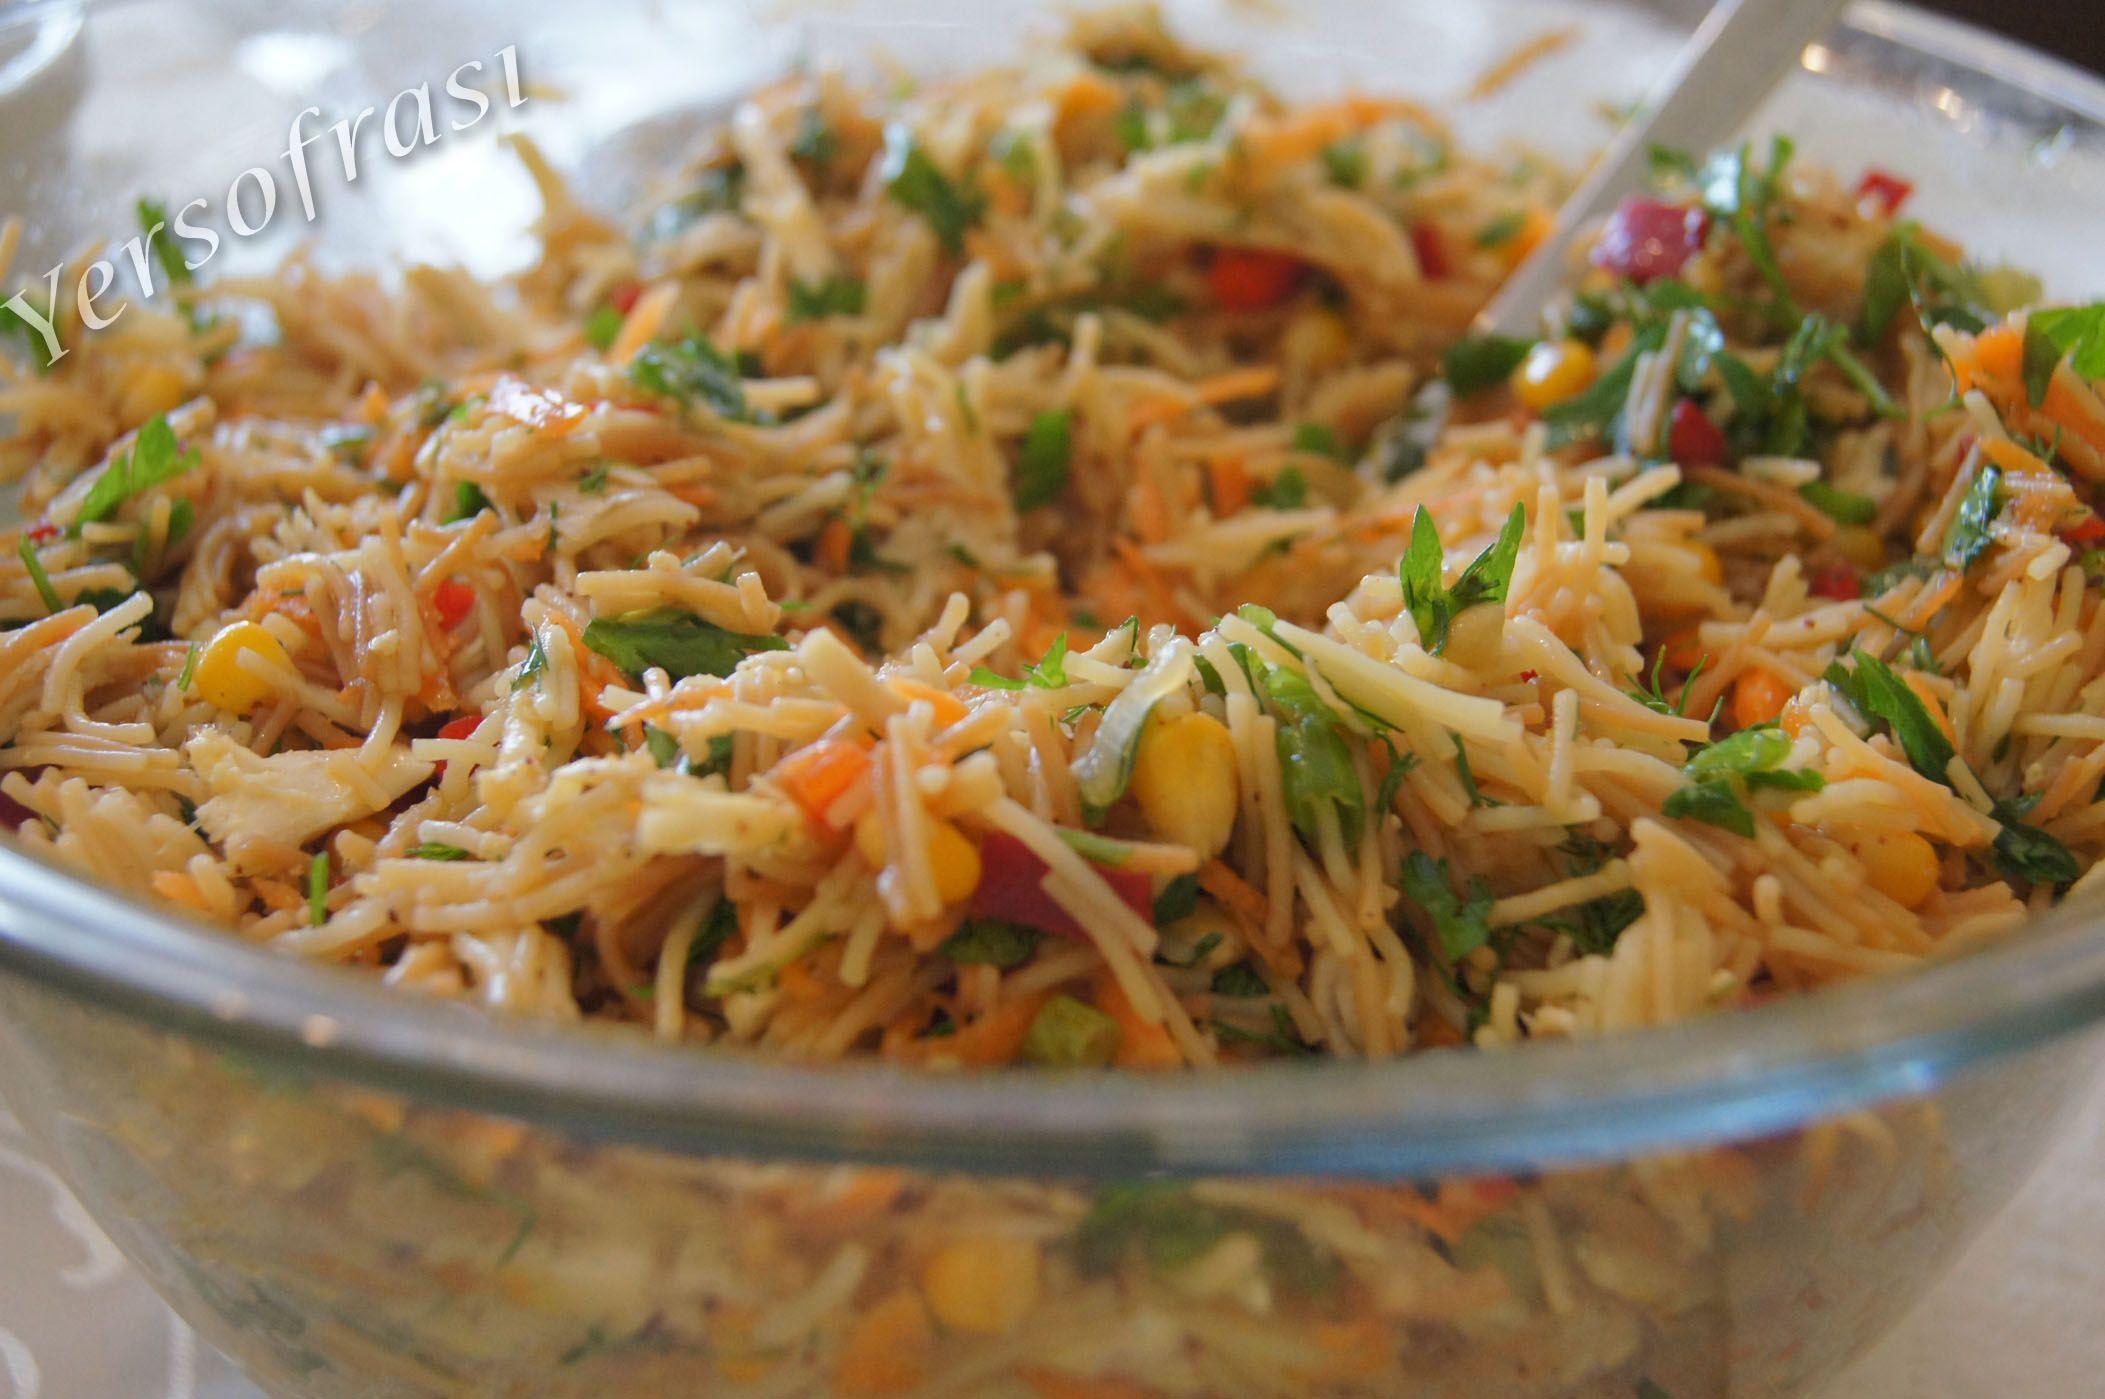 Tavuklu Arpa Şehriye Salatası Videosu